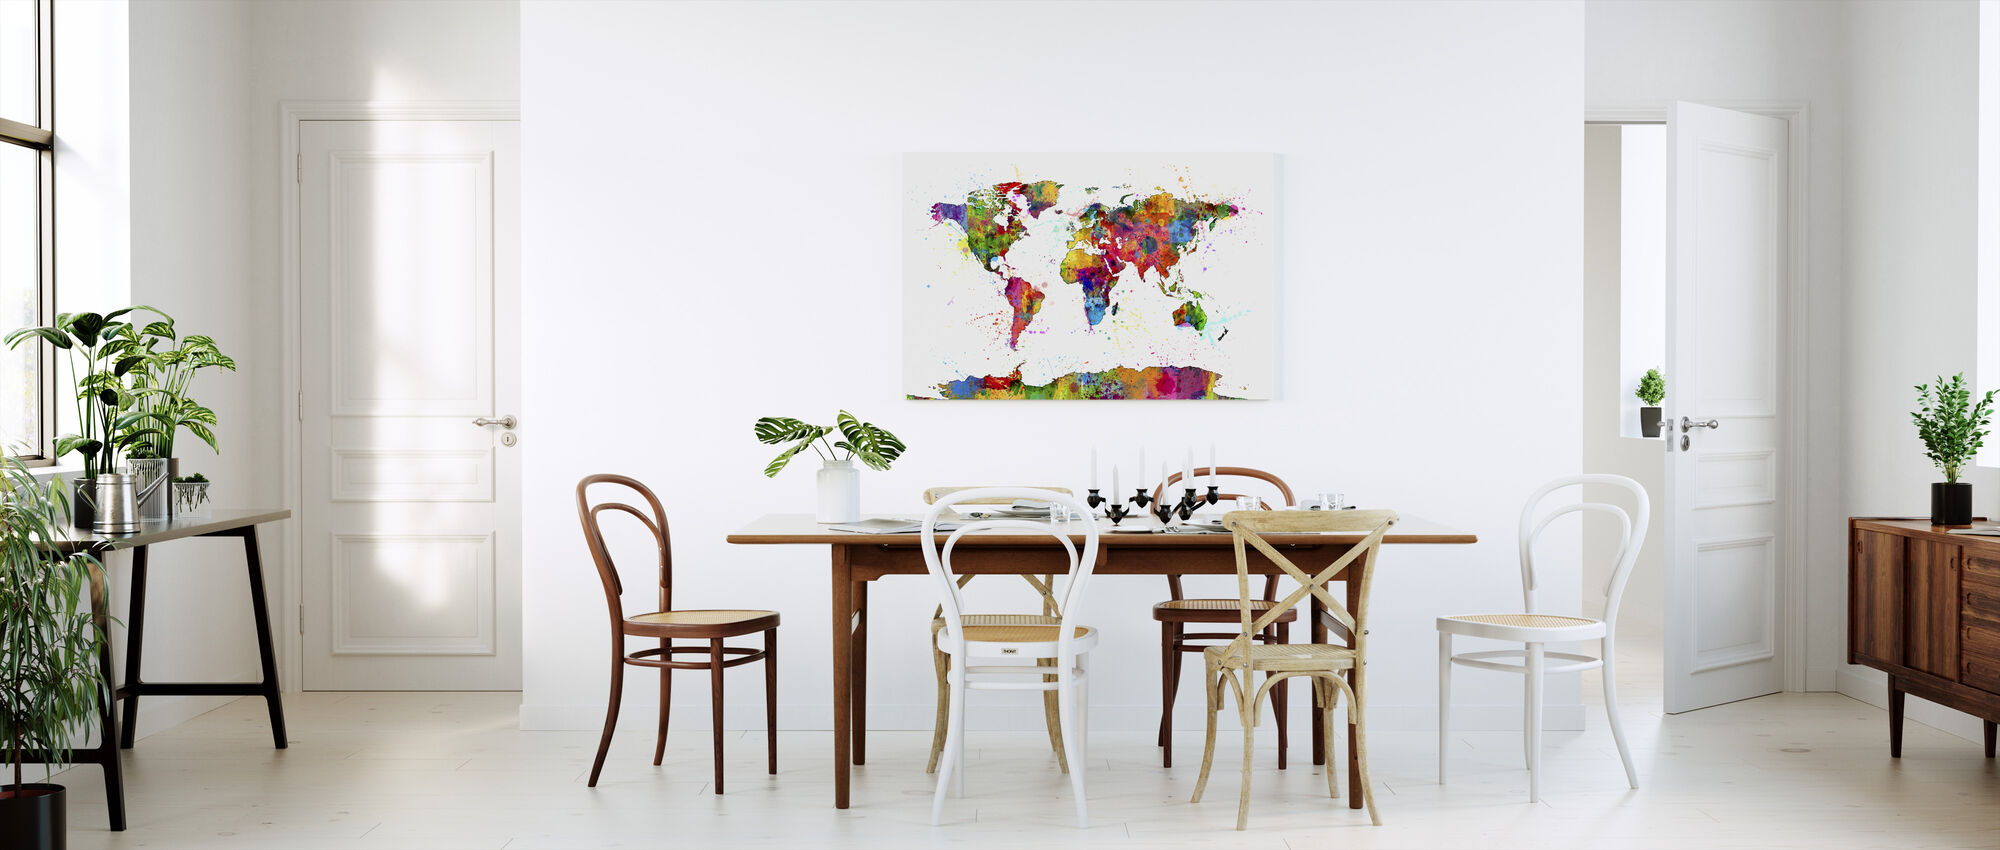 Paint Splashes Map 2 - Canvas print - Kitchen